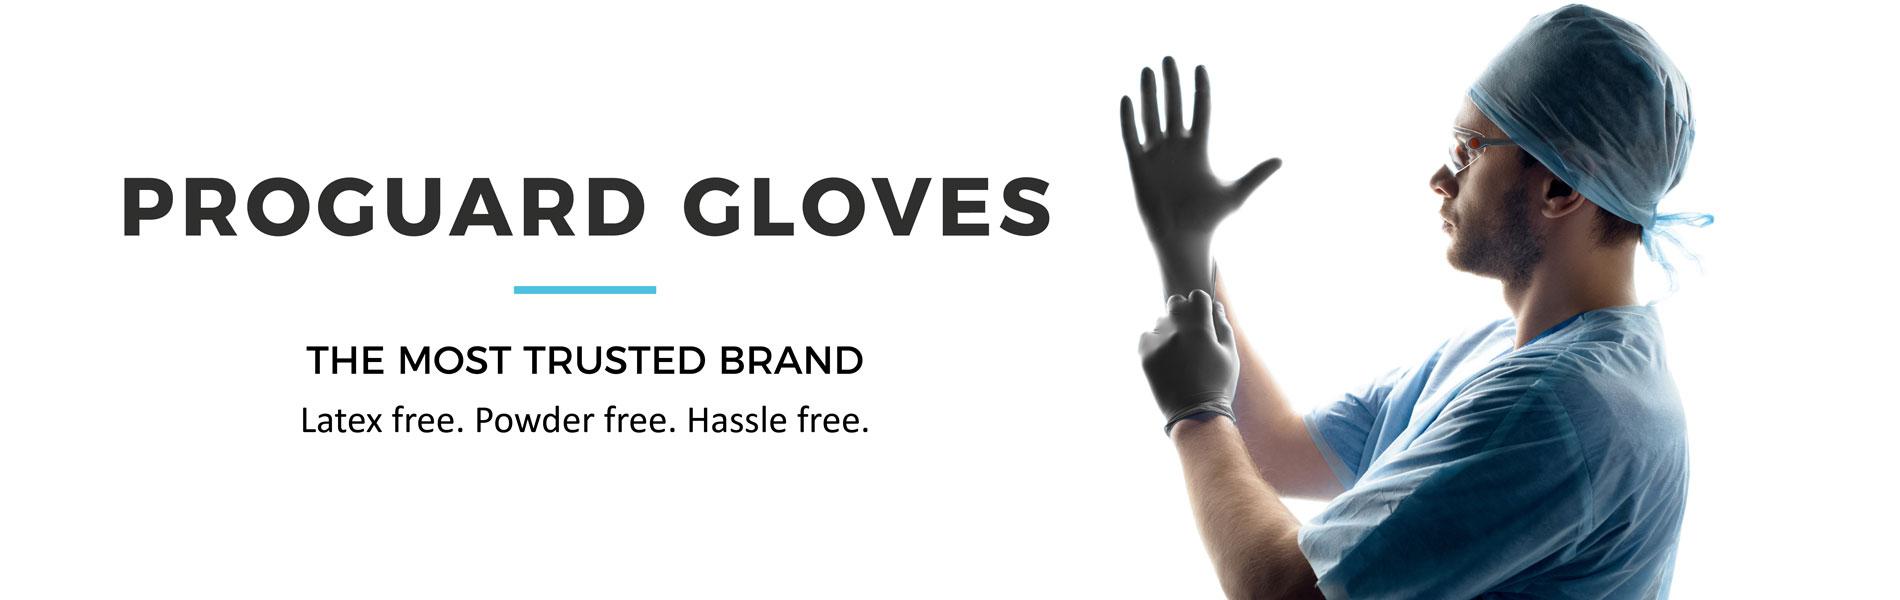 Home_Proguard-Leaded-Attenuation-Gloves-ed-1900x600.jpg